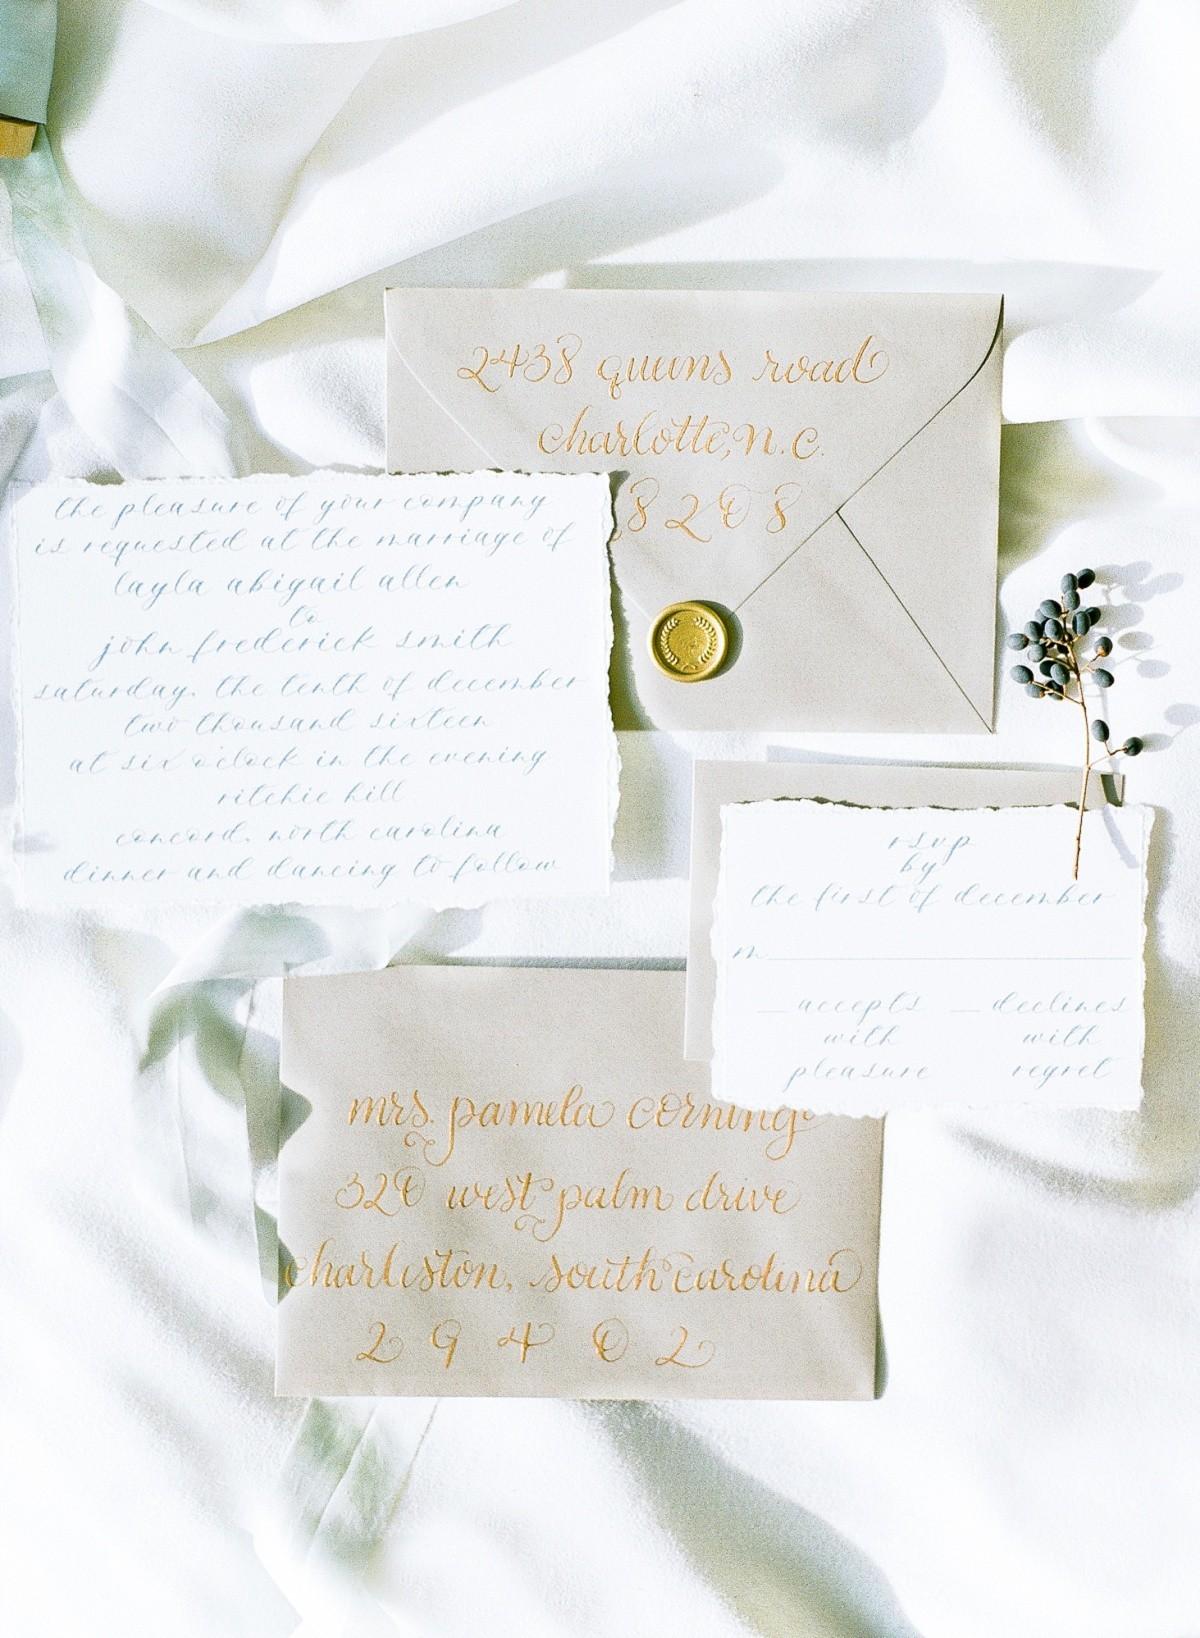 Ritchie_Hill_Wedding_Photos_timeless_winter_wedding_smm_photography_46.jpg